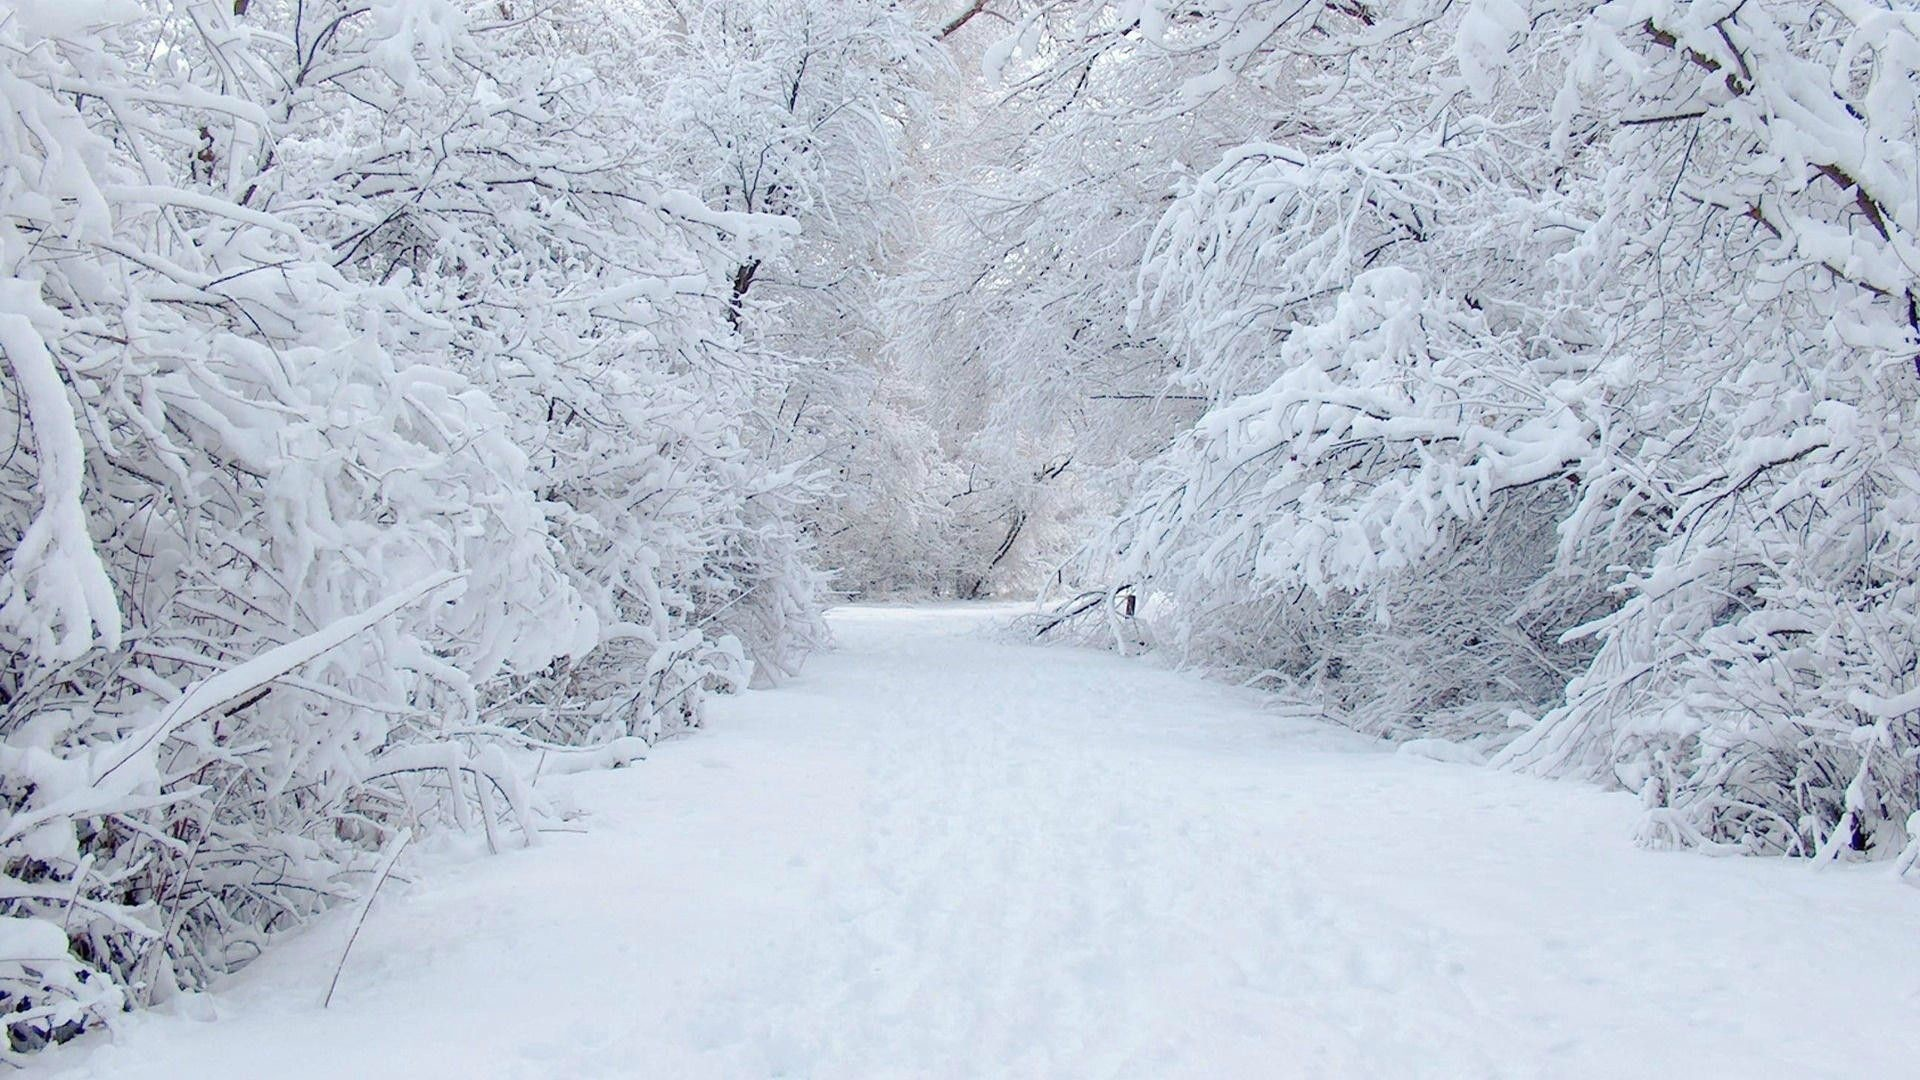 Snowy Download Wallpaper